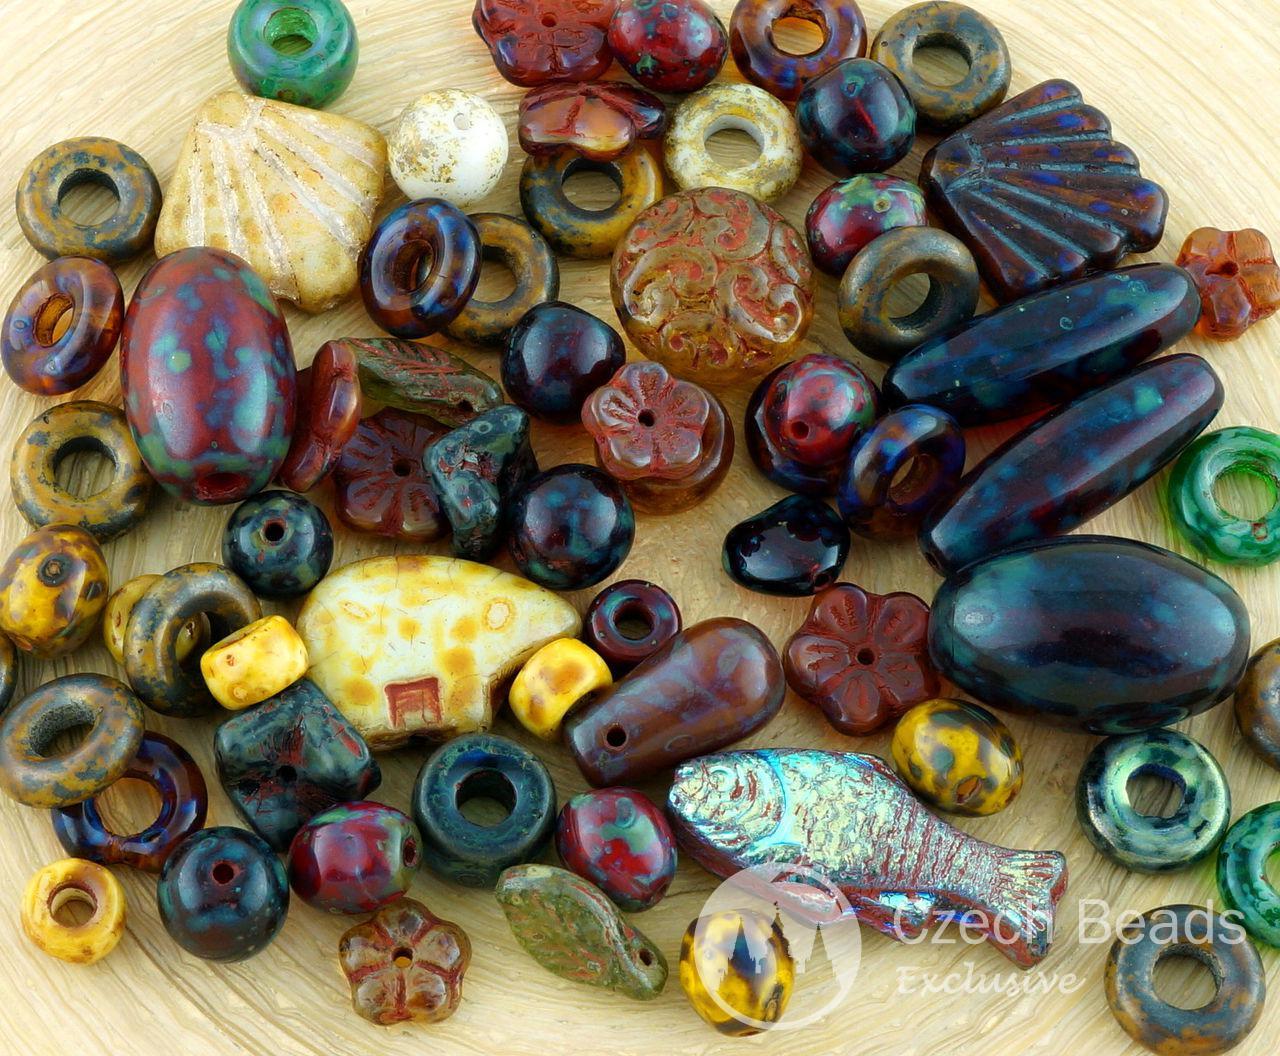 50g Anissa Picasso Multicolor Super Mega Mix Rústico Tierra Tribal Flor Oso Shell Peces Oval Redondo Cuadrado Anillo de Cristal checo Bolas de Bolas Sopa para $ 5.94 de Czech Beads Exclusive